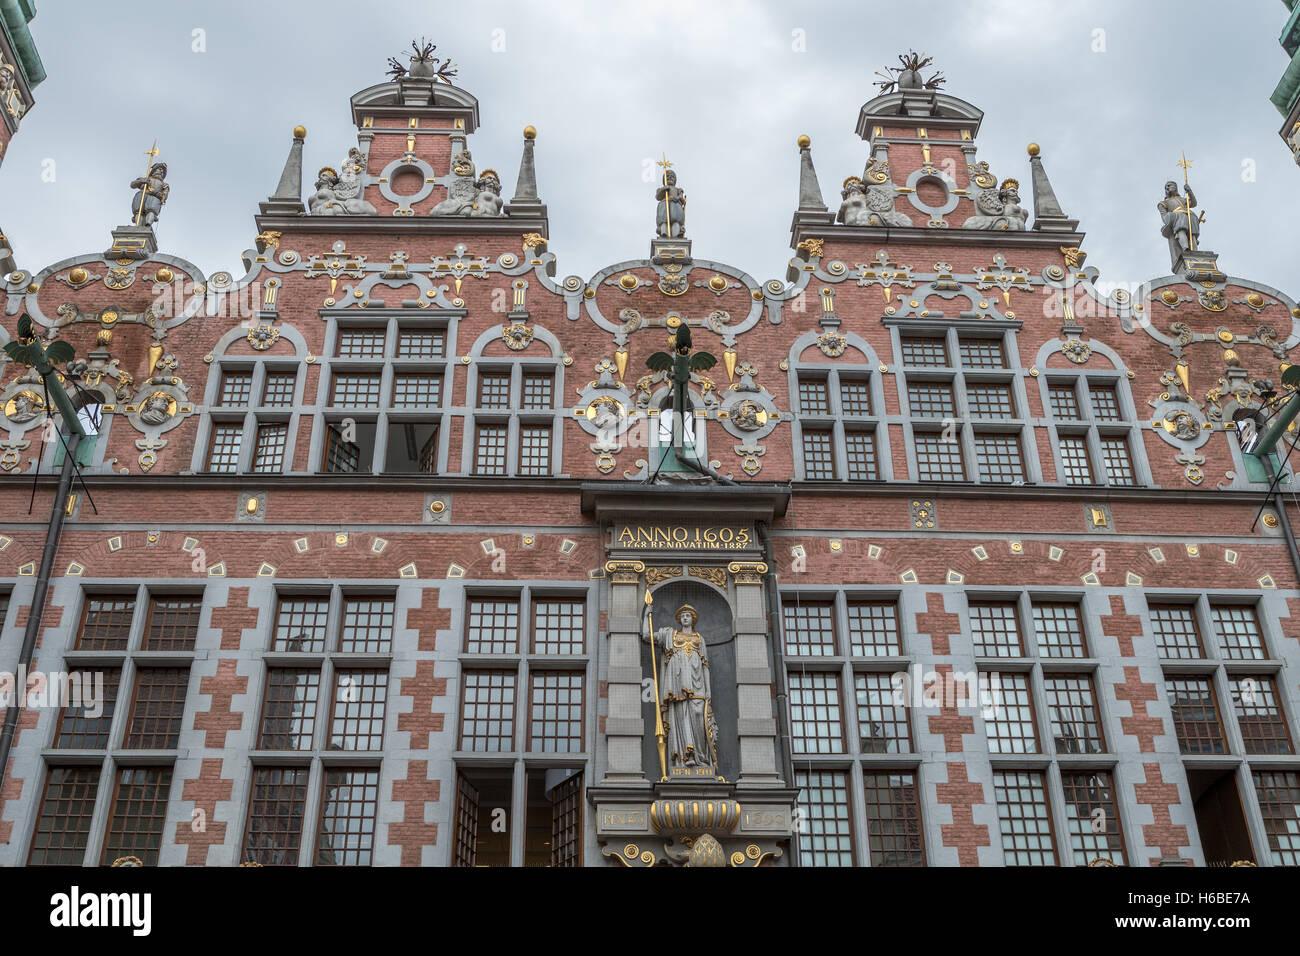 The Armoury Gdansk Poland. Dutch Renaissance architecture - Stock Image